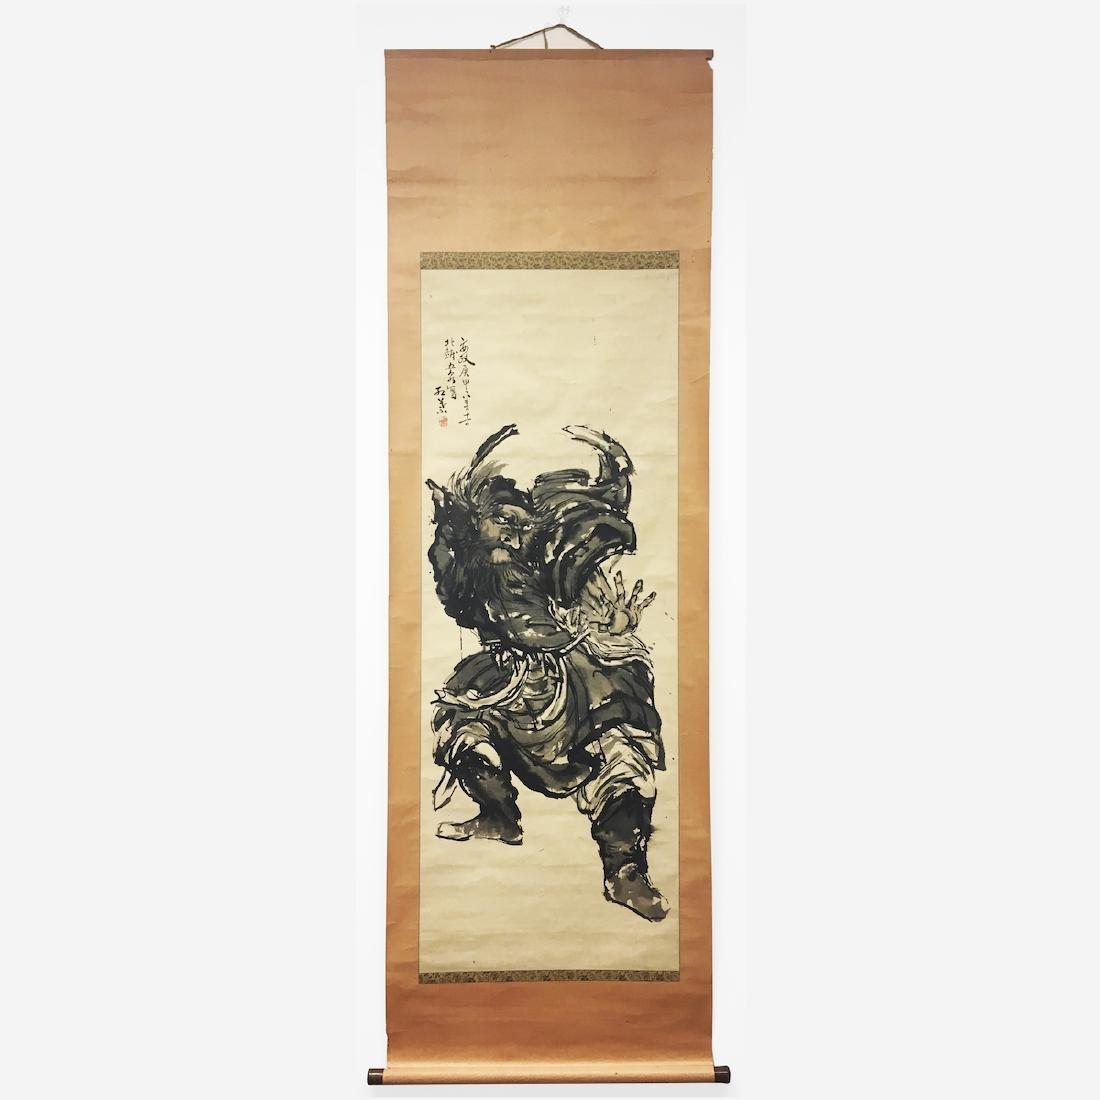 Japanese Scroll, Depicting Shoki